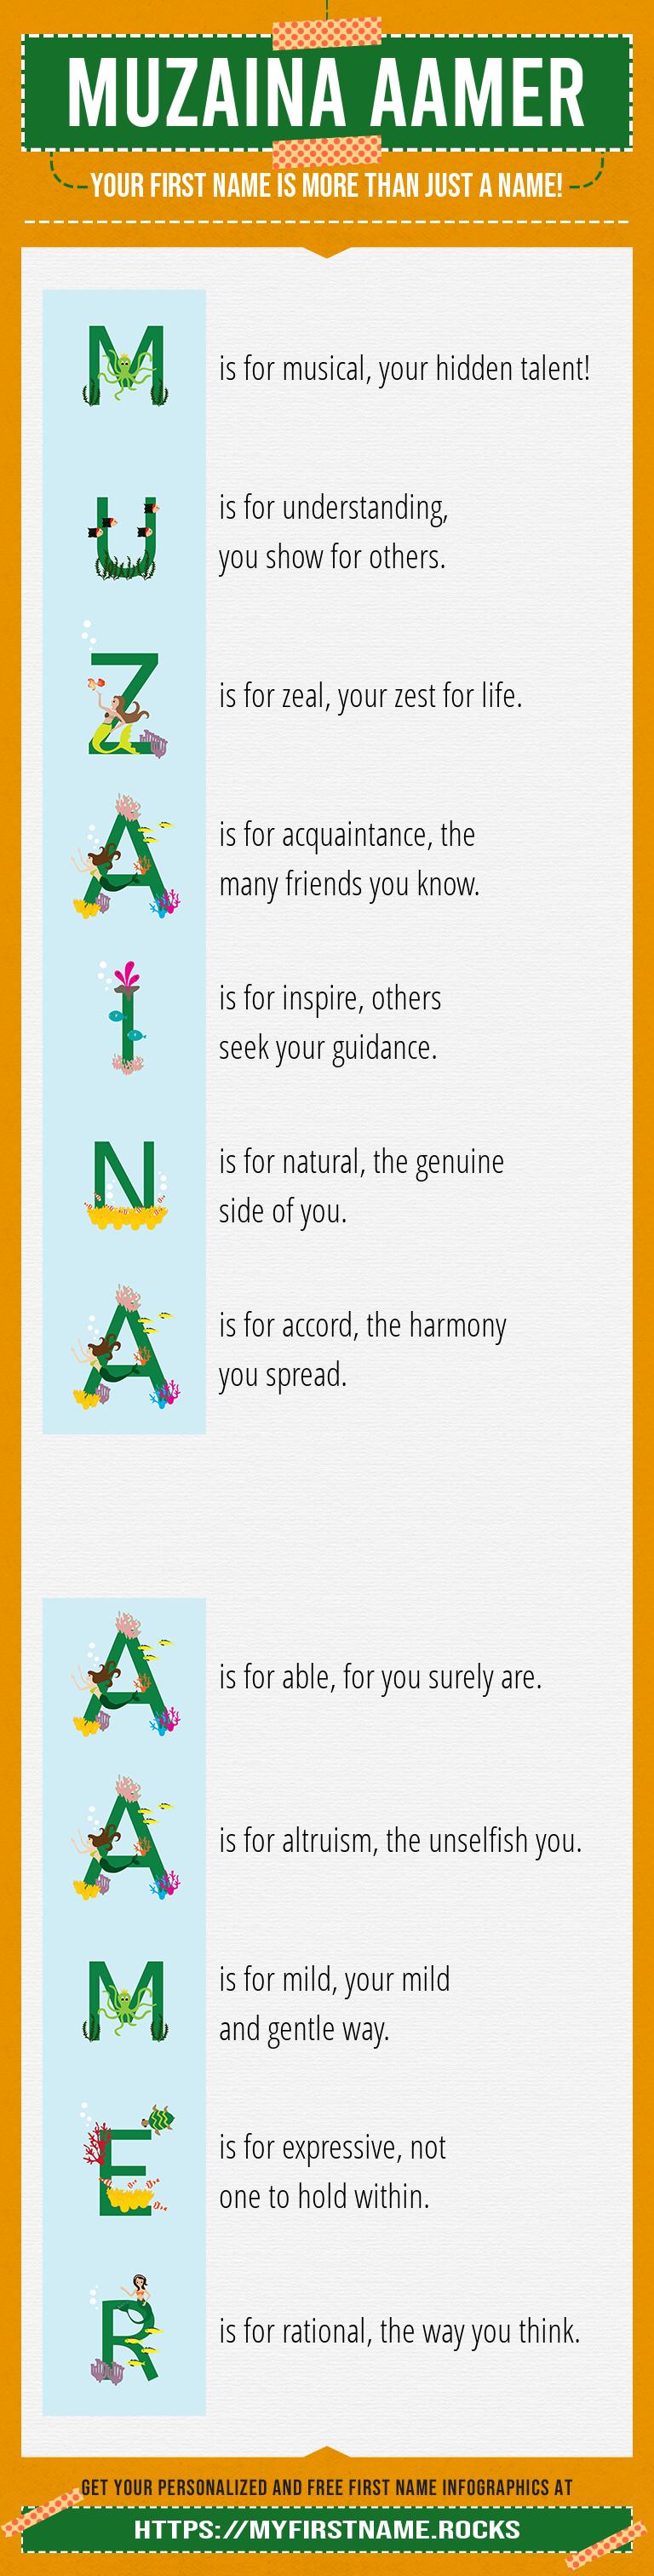 Muzaina Aamer Infographics